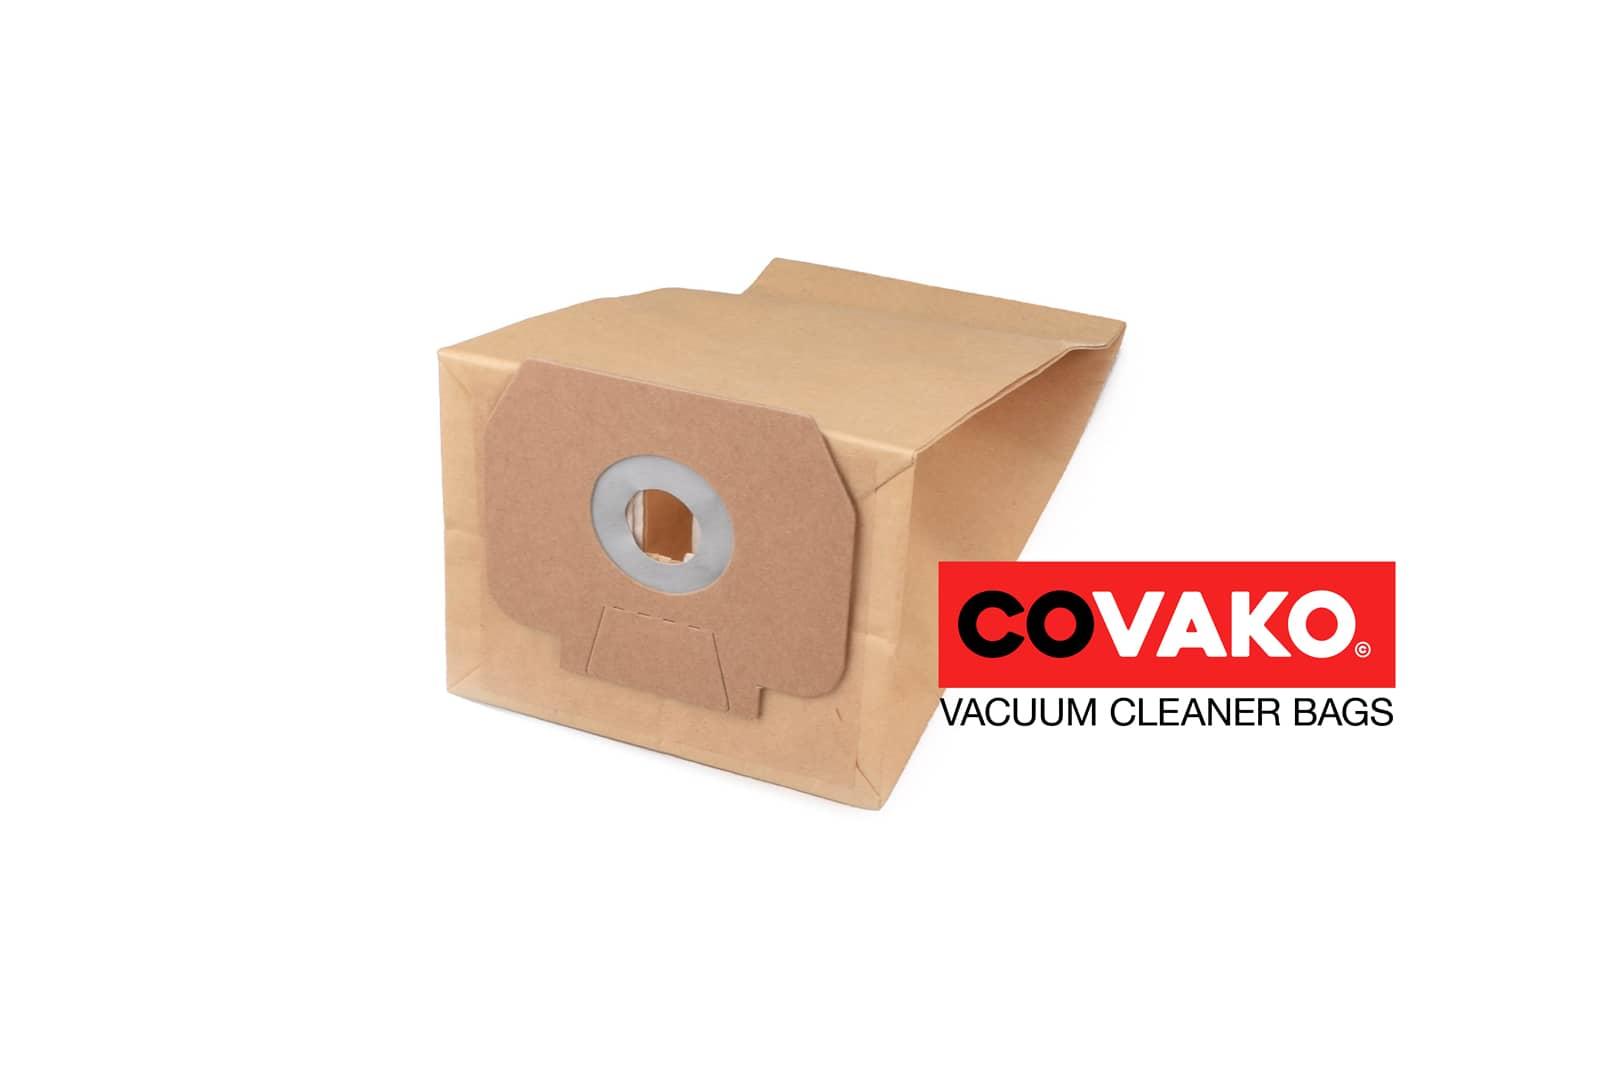 Oehme Otto RS 09 / Papier - Oehme Otto sacs d'aspirateur